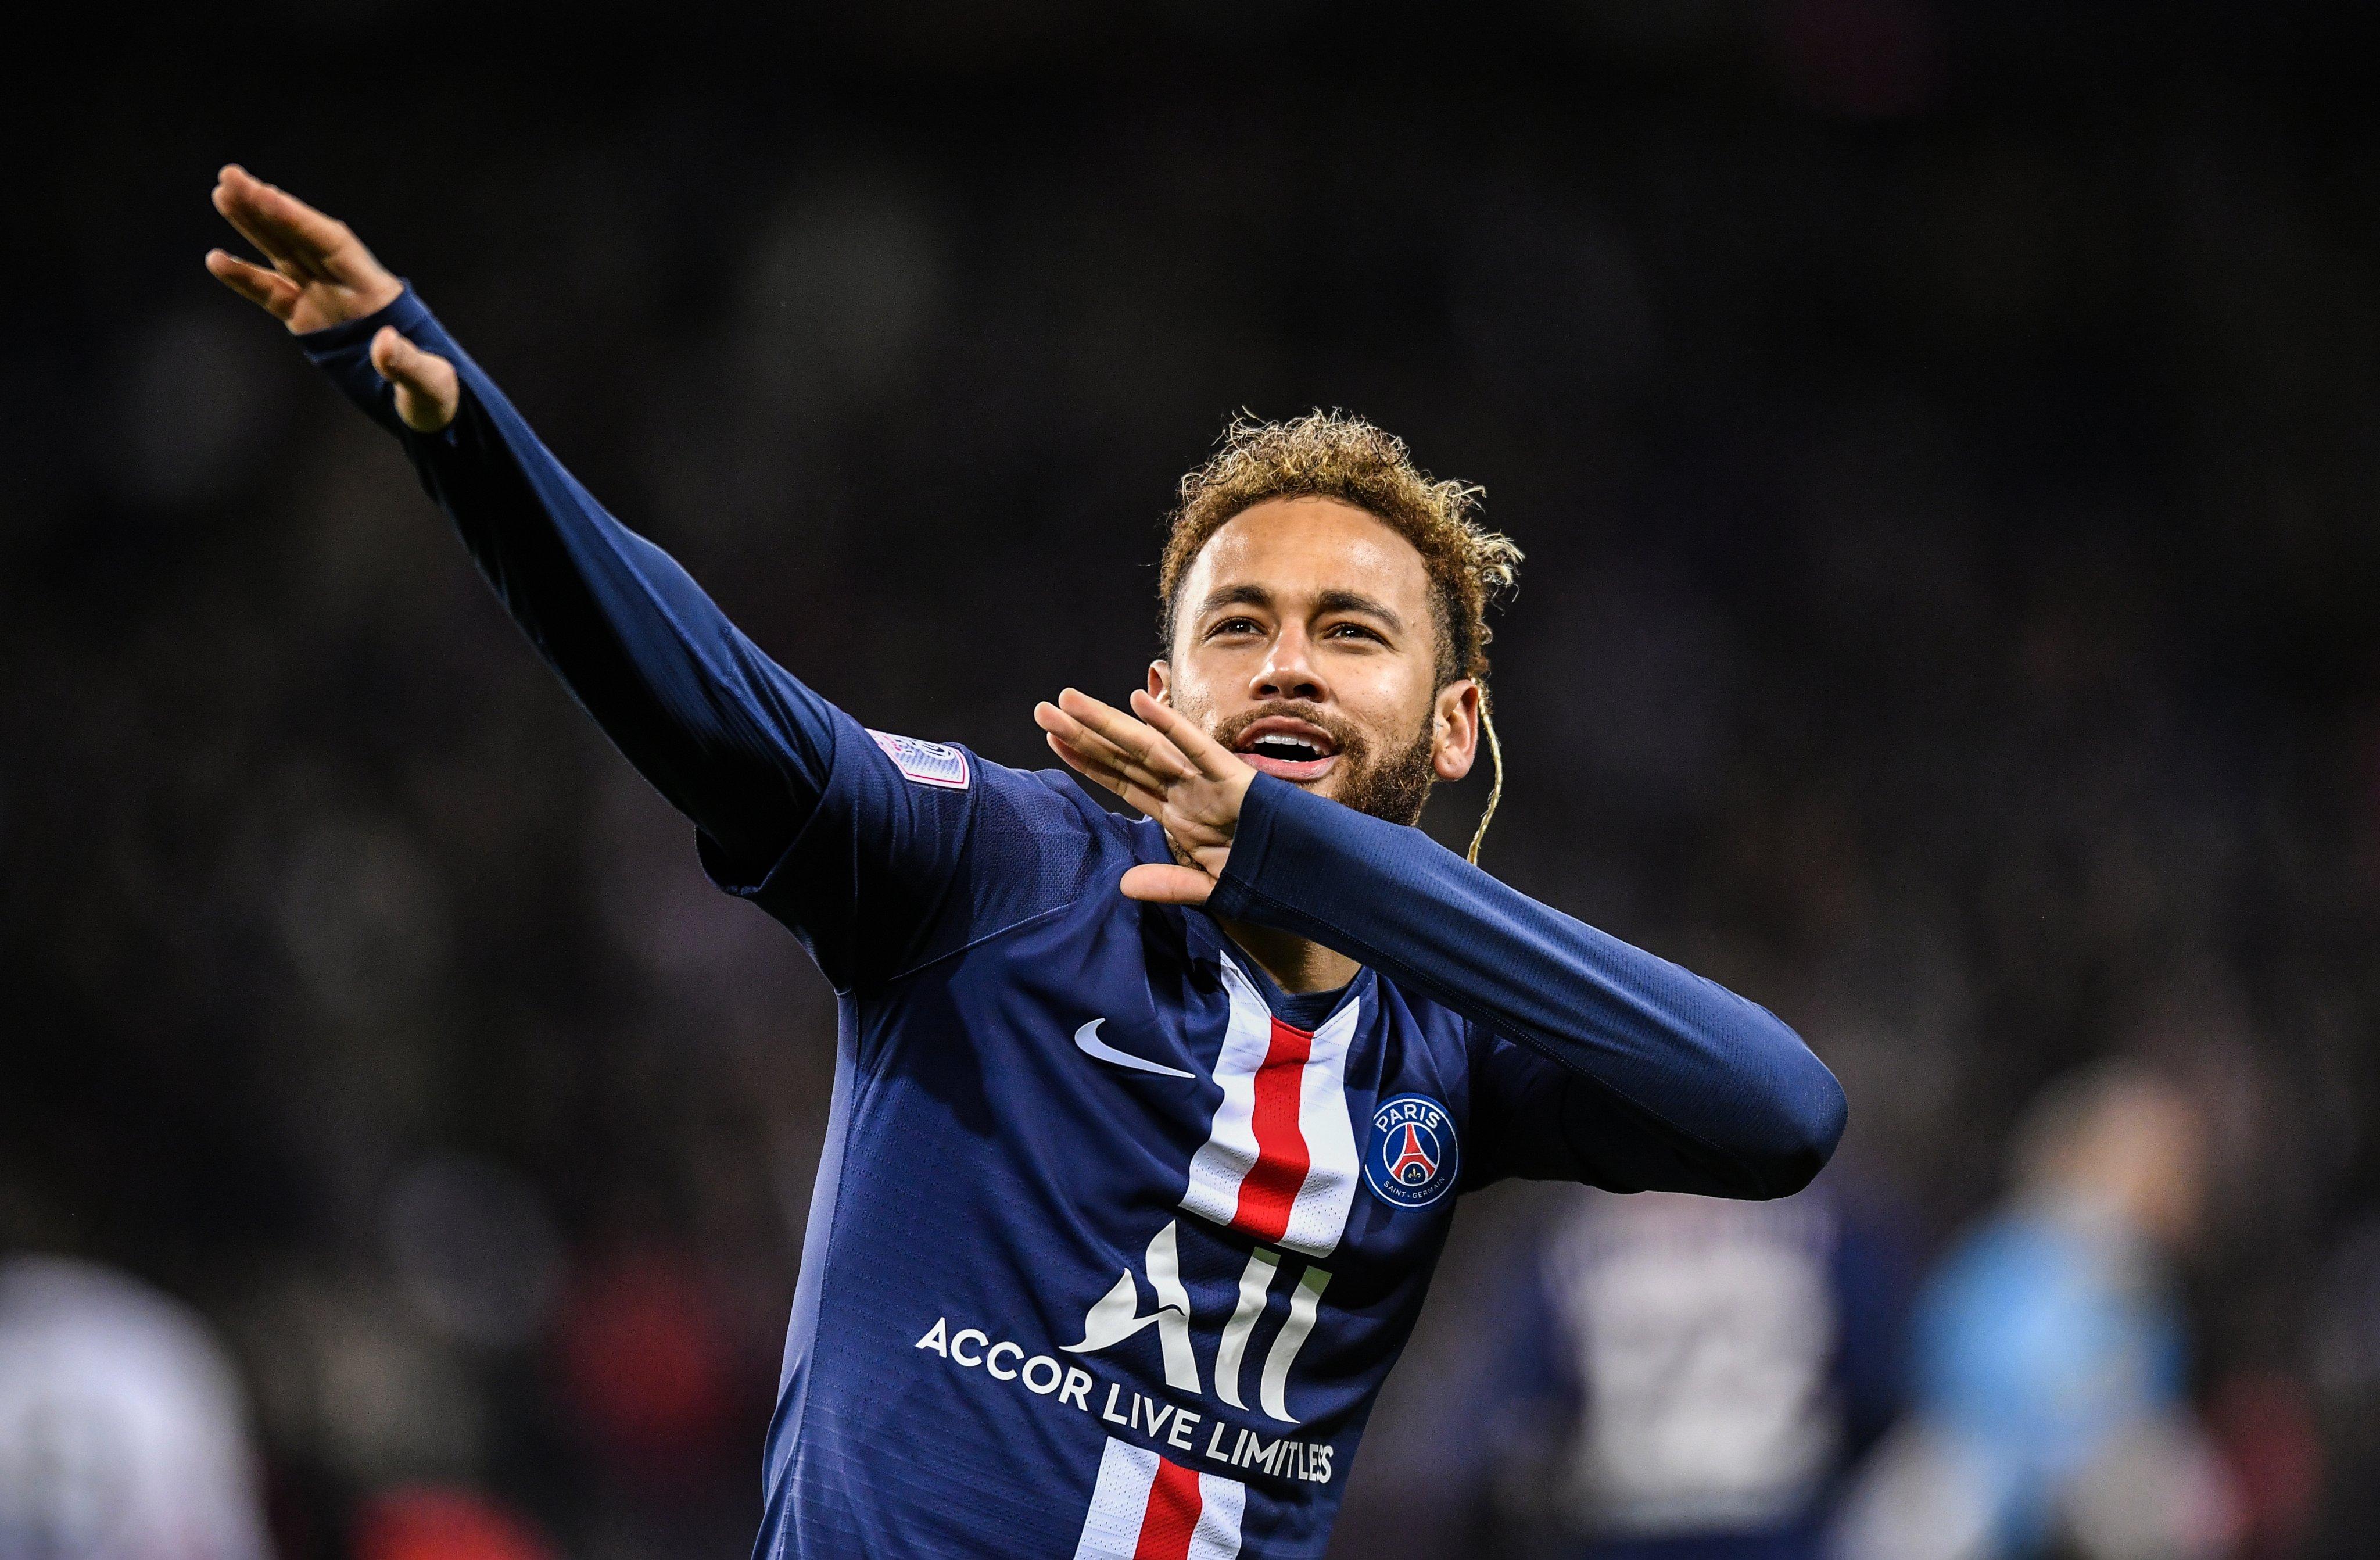 Neymar iguala recorde de Bianchi e Mbappé no PSG e pode superar ...